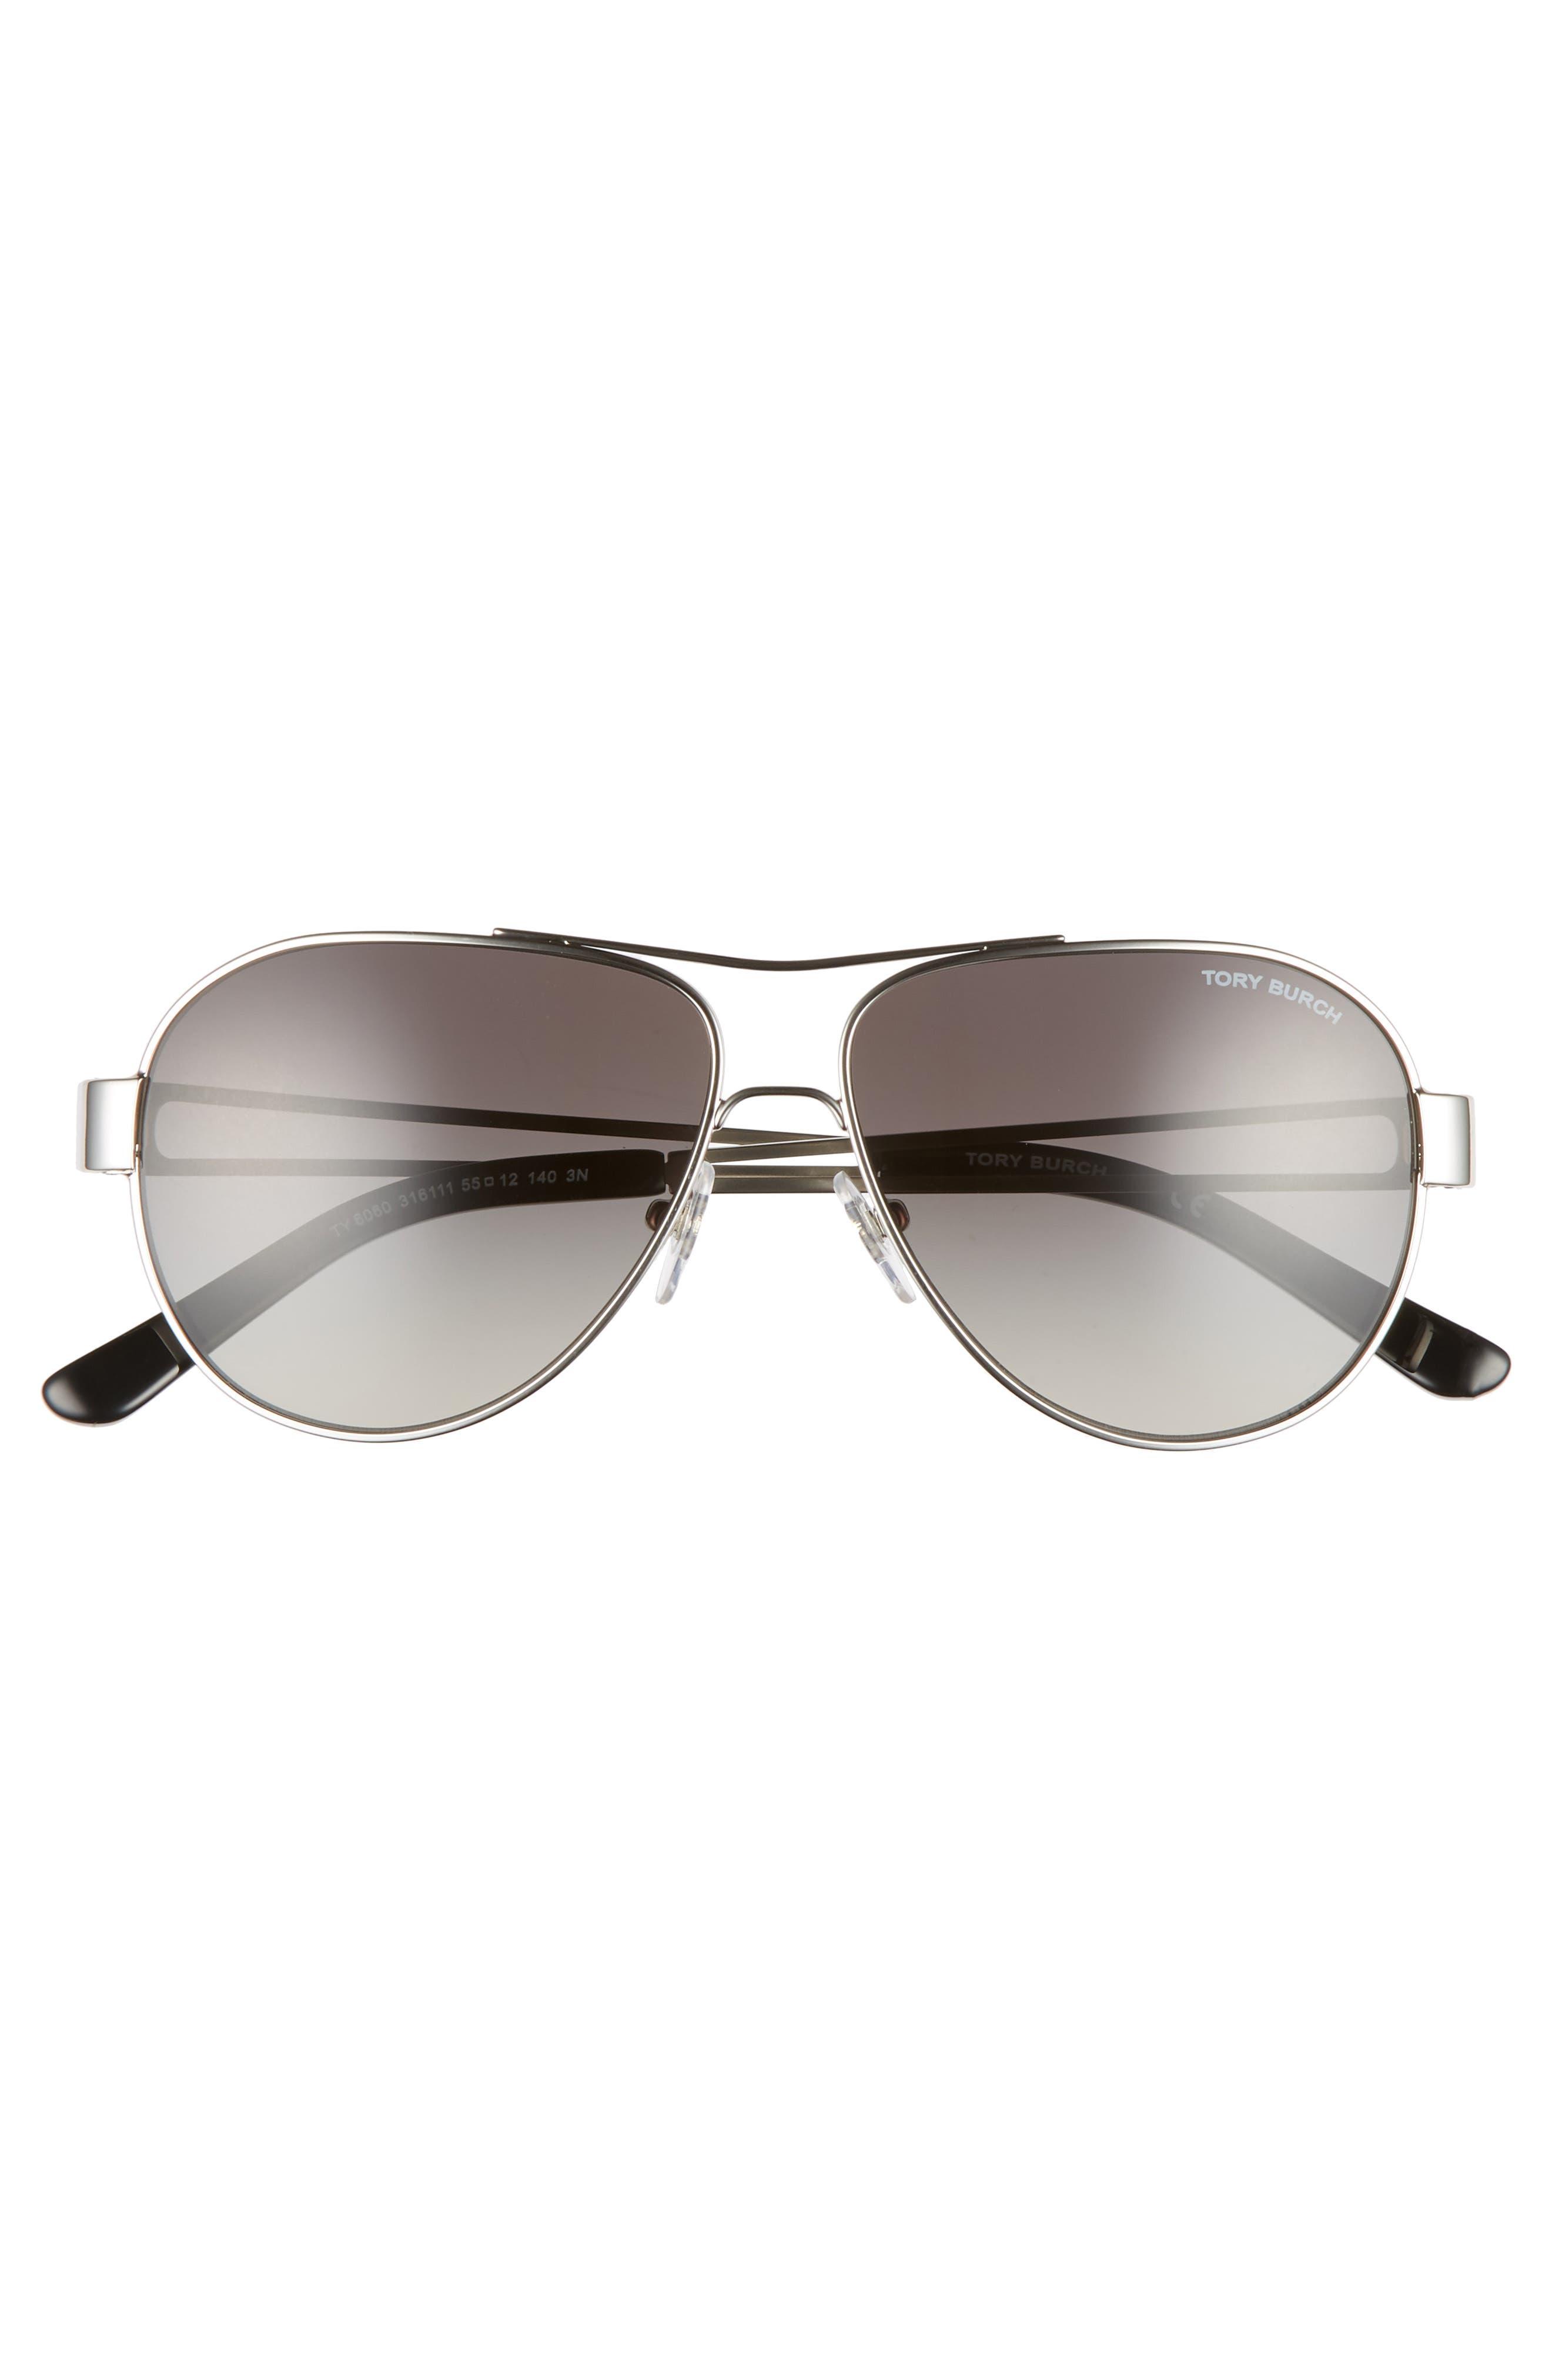 TORY BURCH,                             55mm Polarized Aviator Sunglasses,                             Alternate thumbnail 3, color,                             SILVER/ BLACK GRADIENT